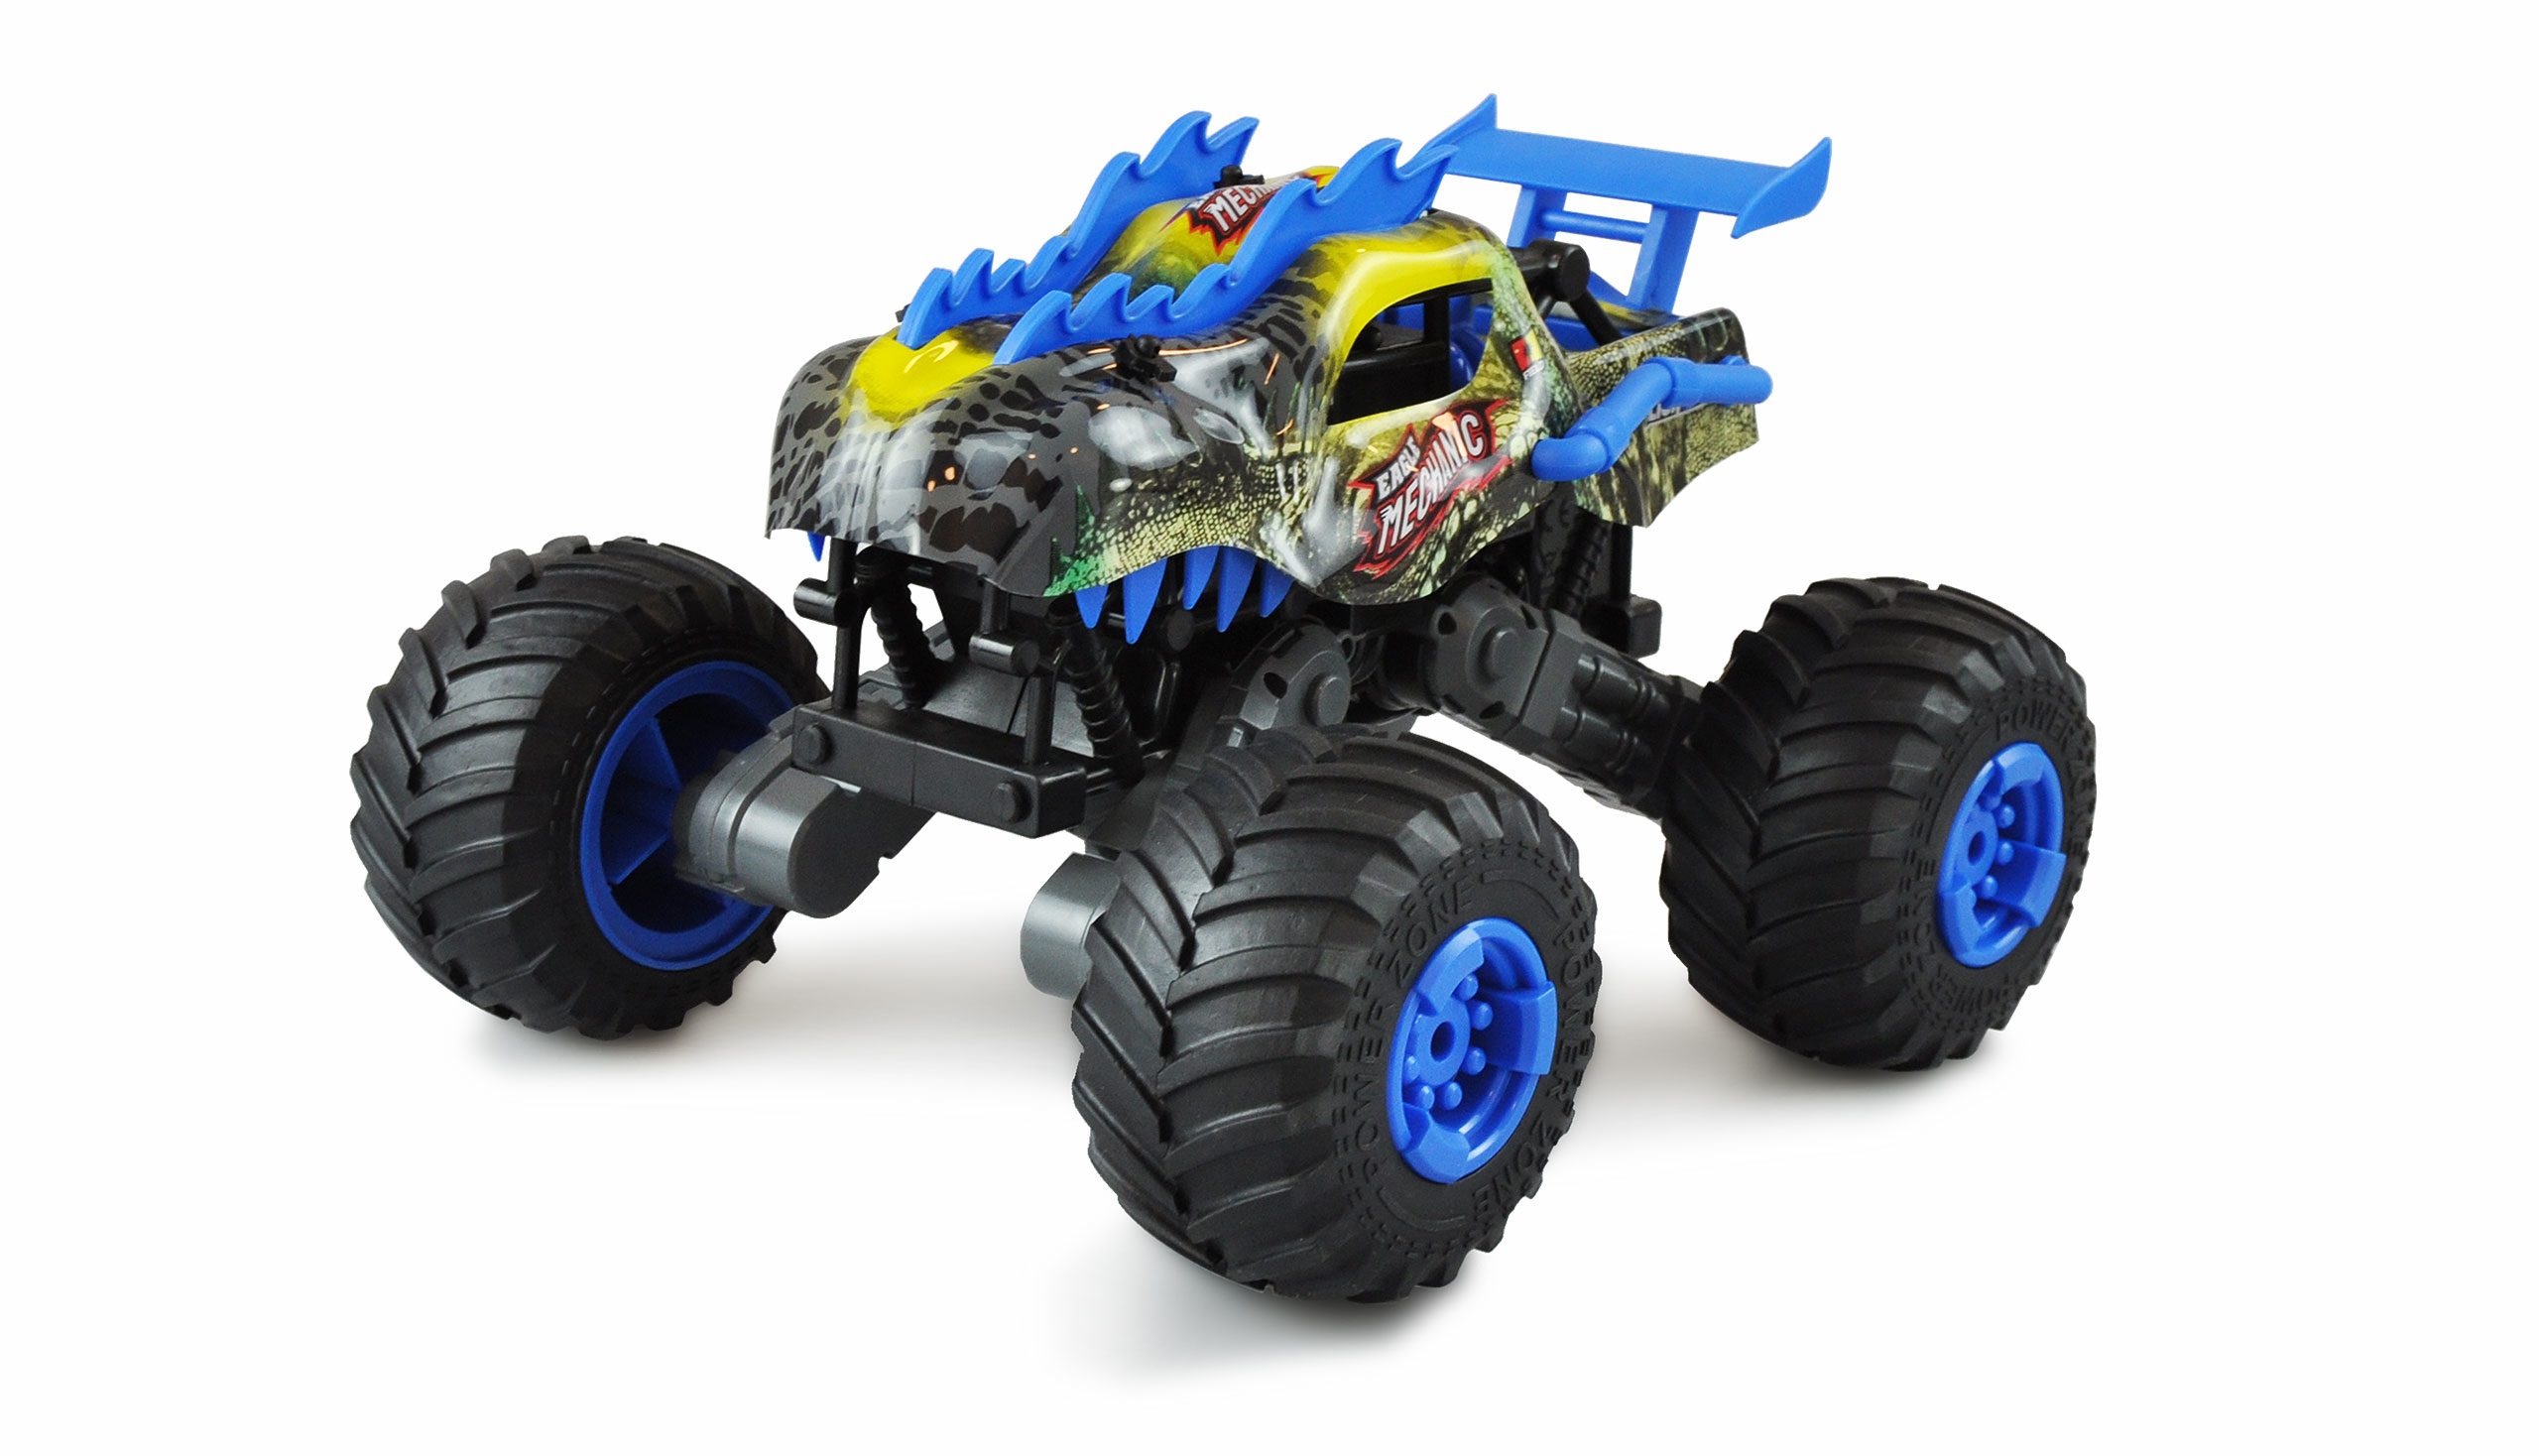 Vorschau: Amewi Mechanic Dinosaur - Monstertruck - 1:16 - Junge - 6 Jahr(e) - 1200 mAh - 1,14 kg